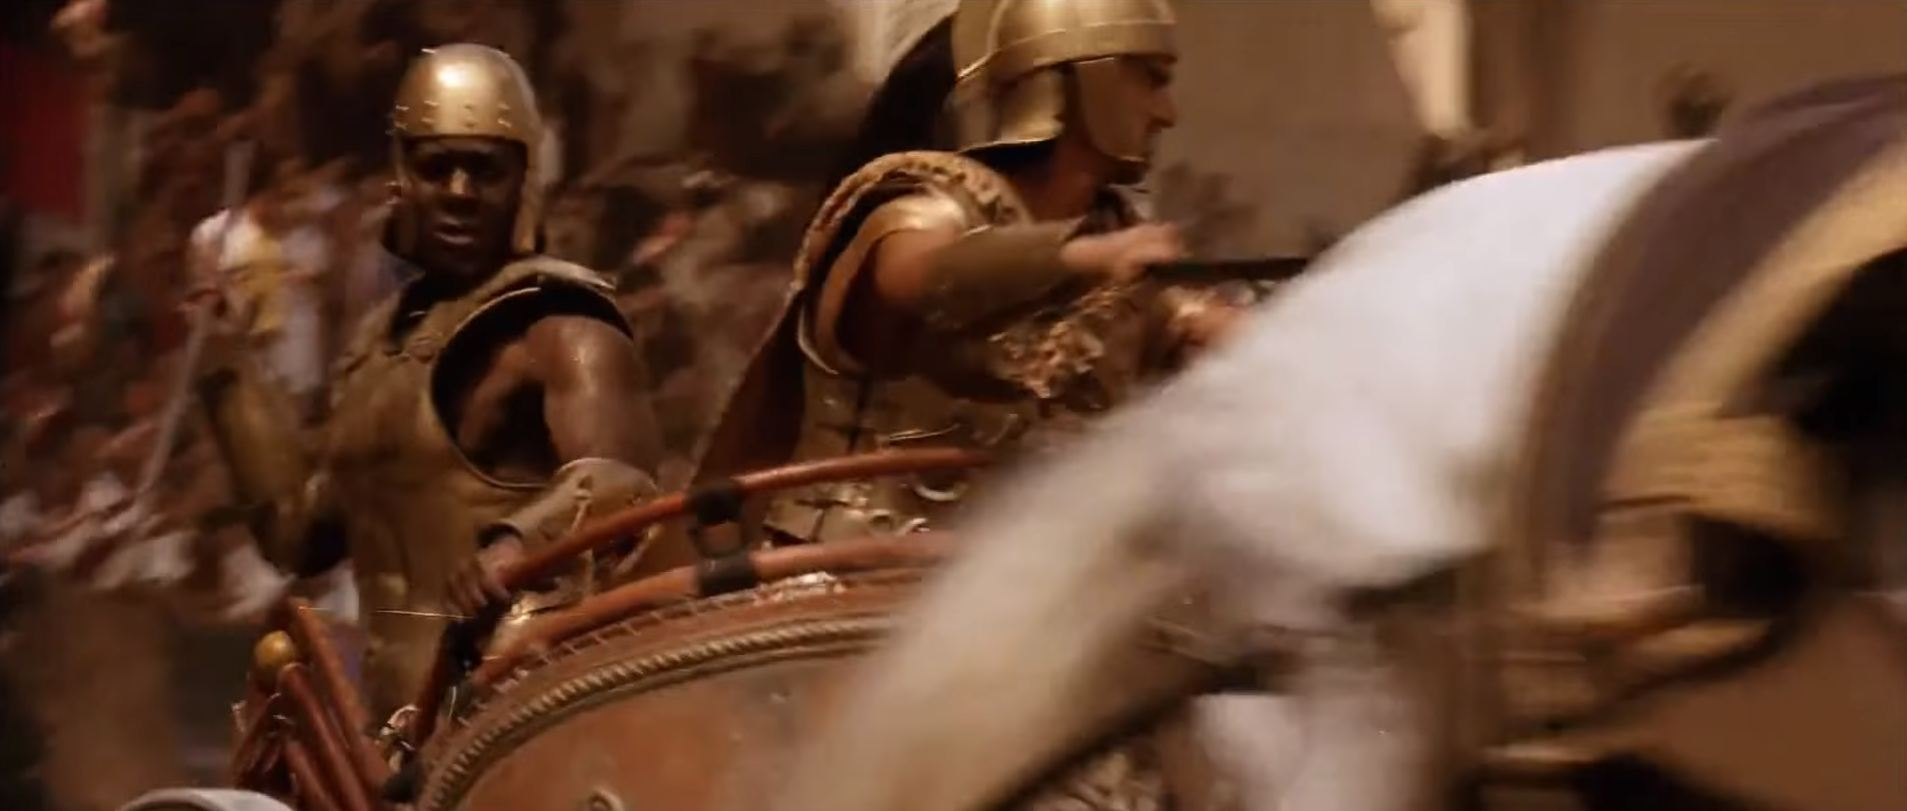 african-gladiator-11